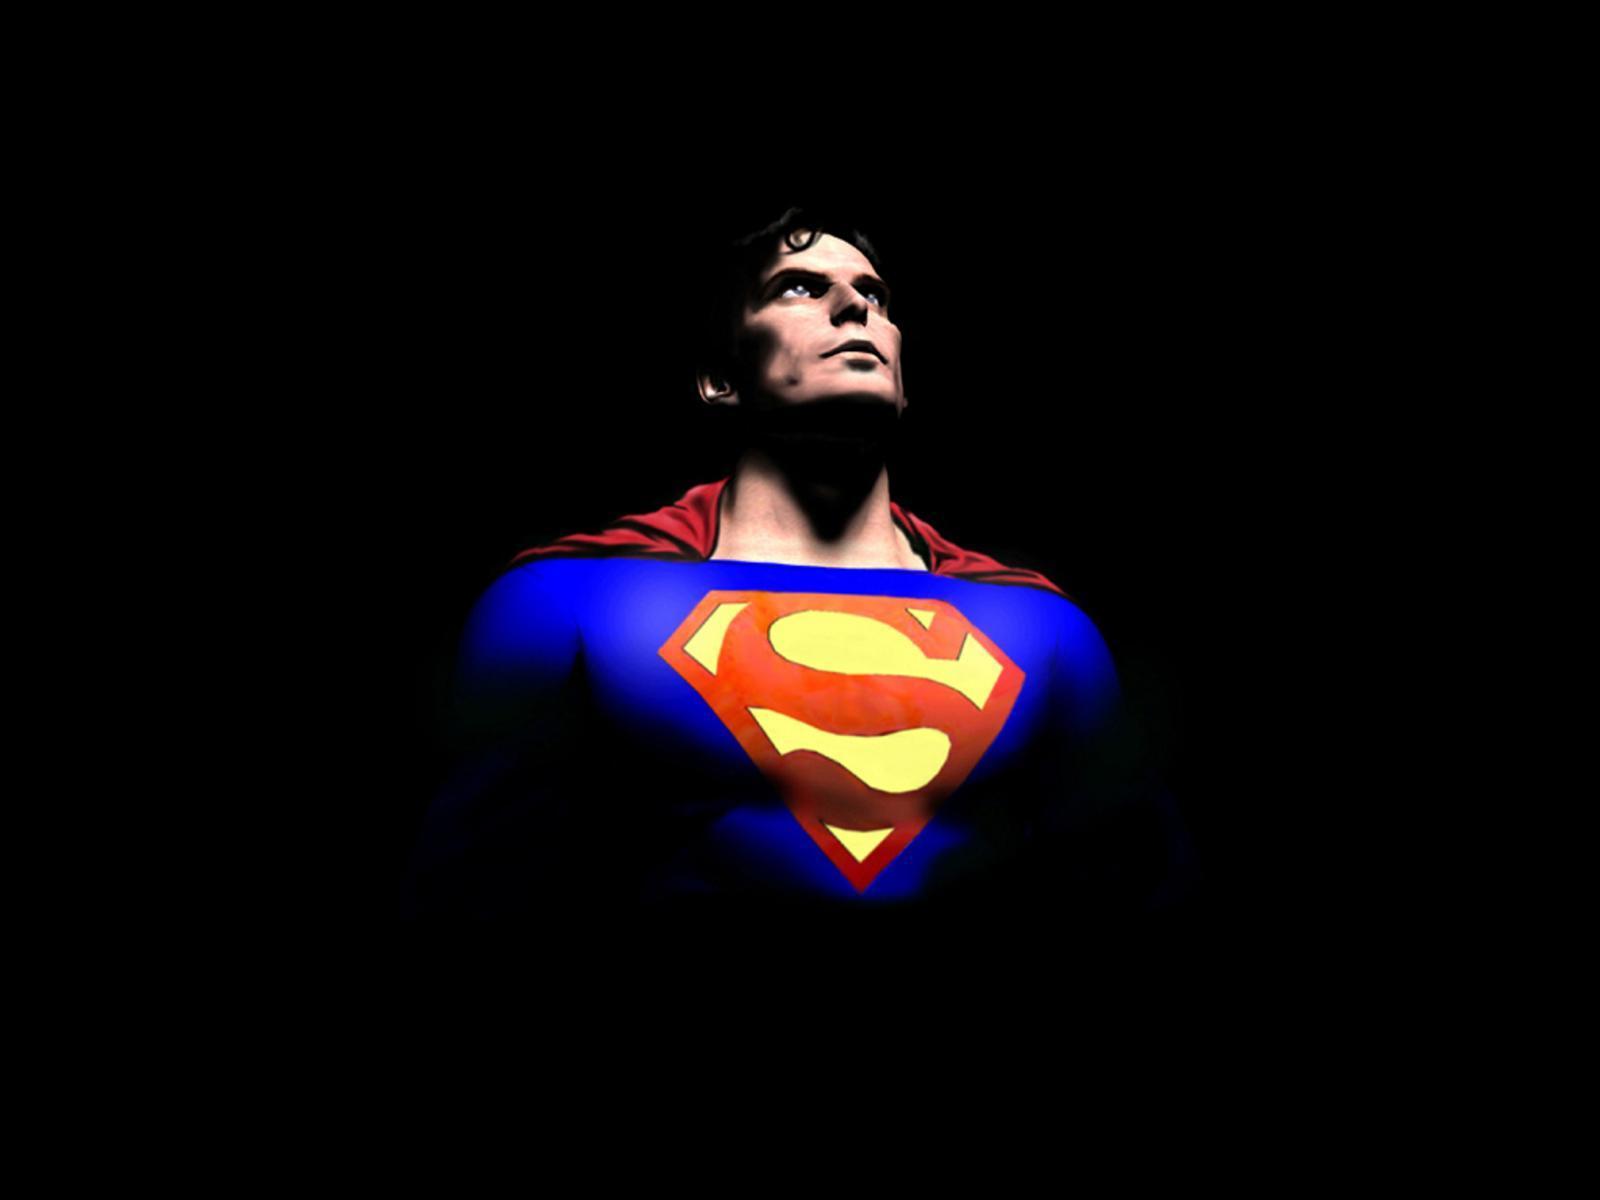 superman wallpaper superman cartoon achtergrond rood met geel superman 1600x1200